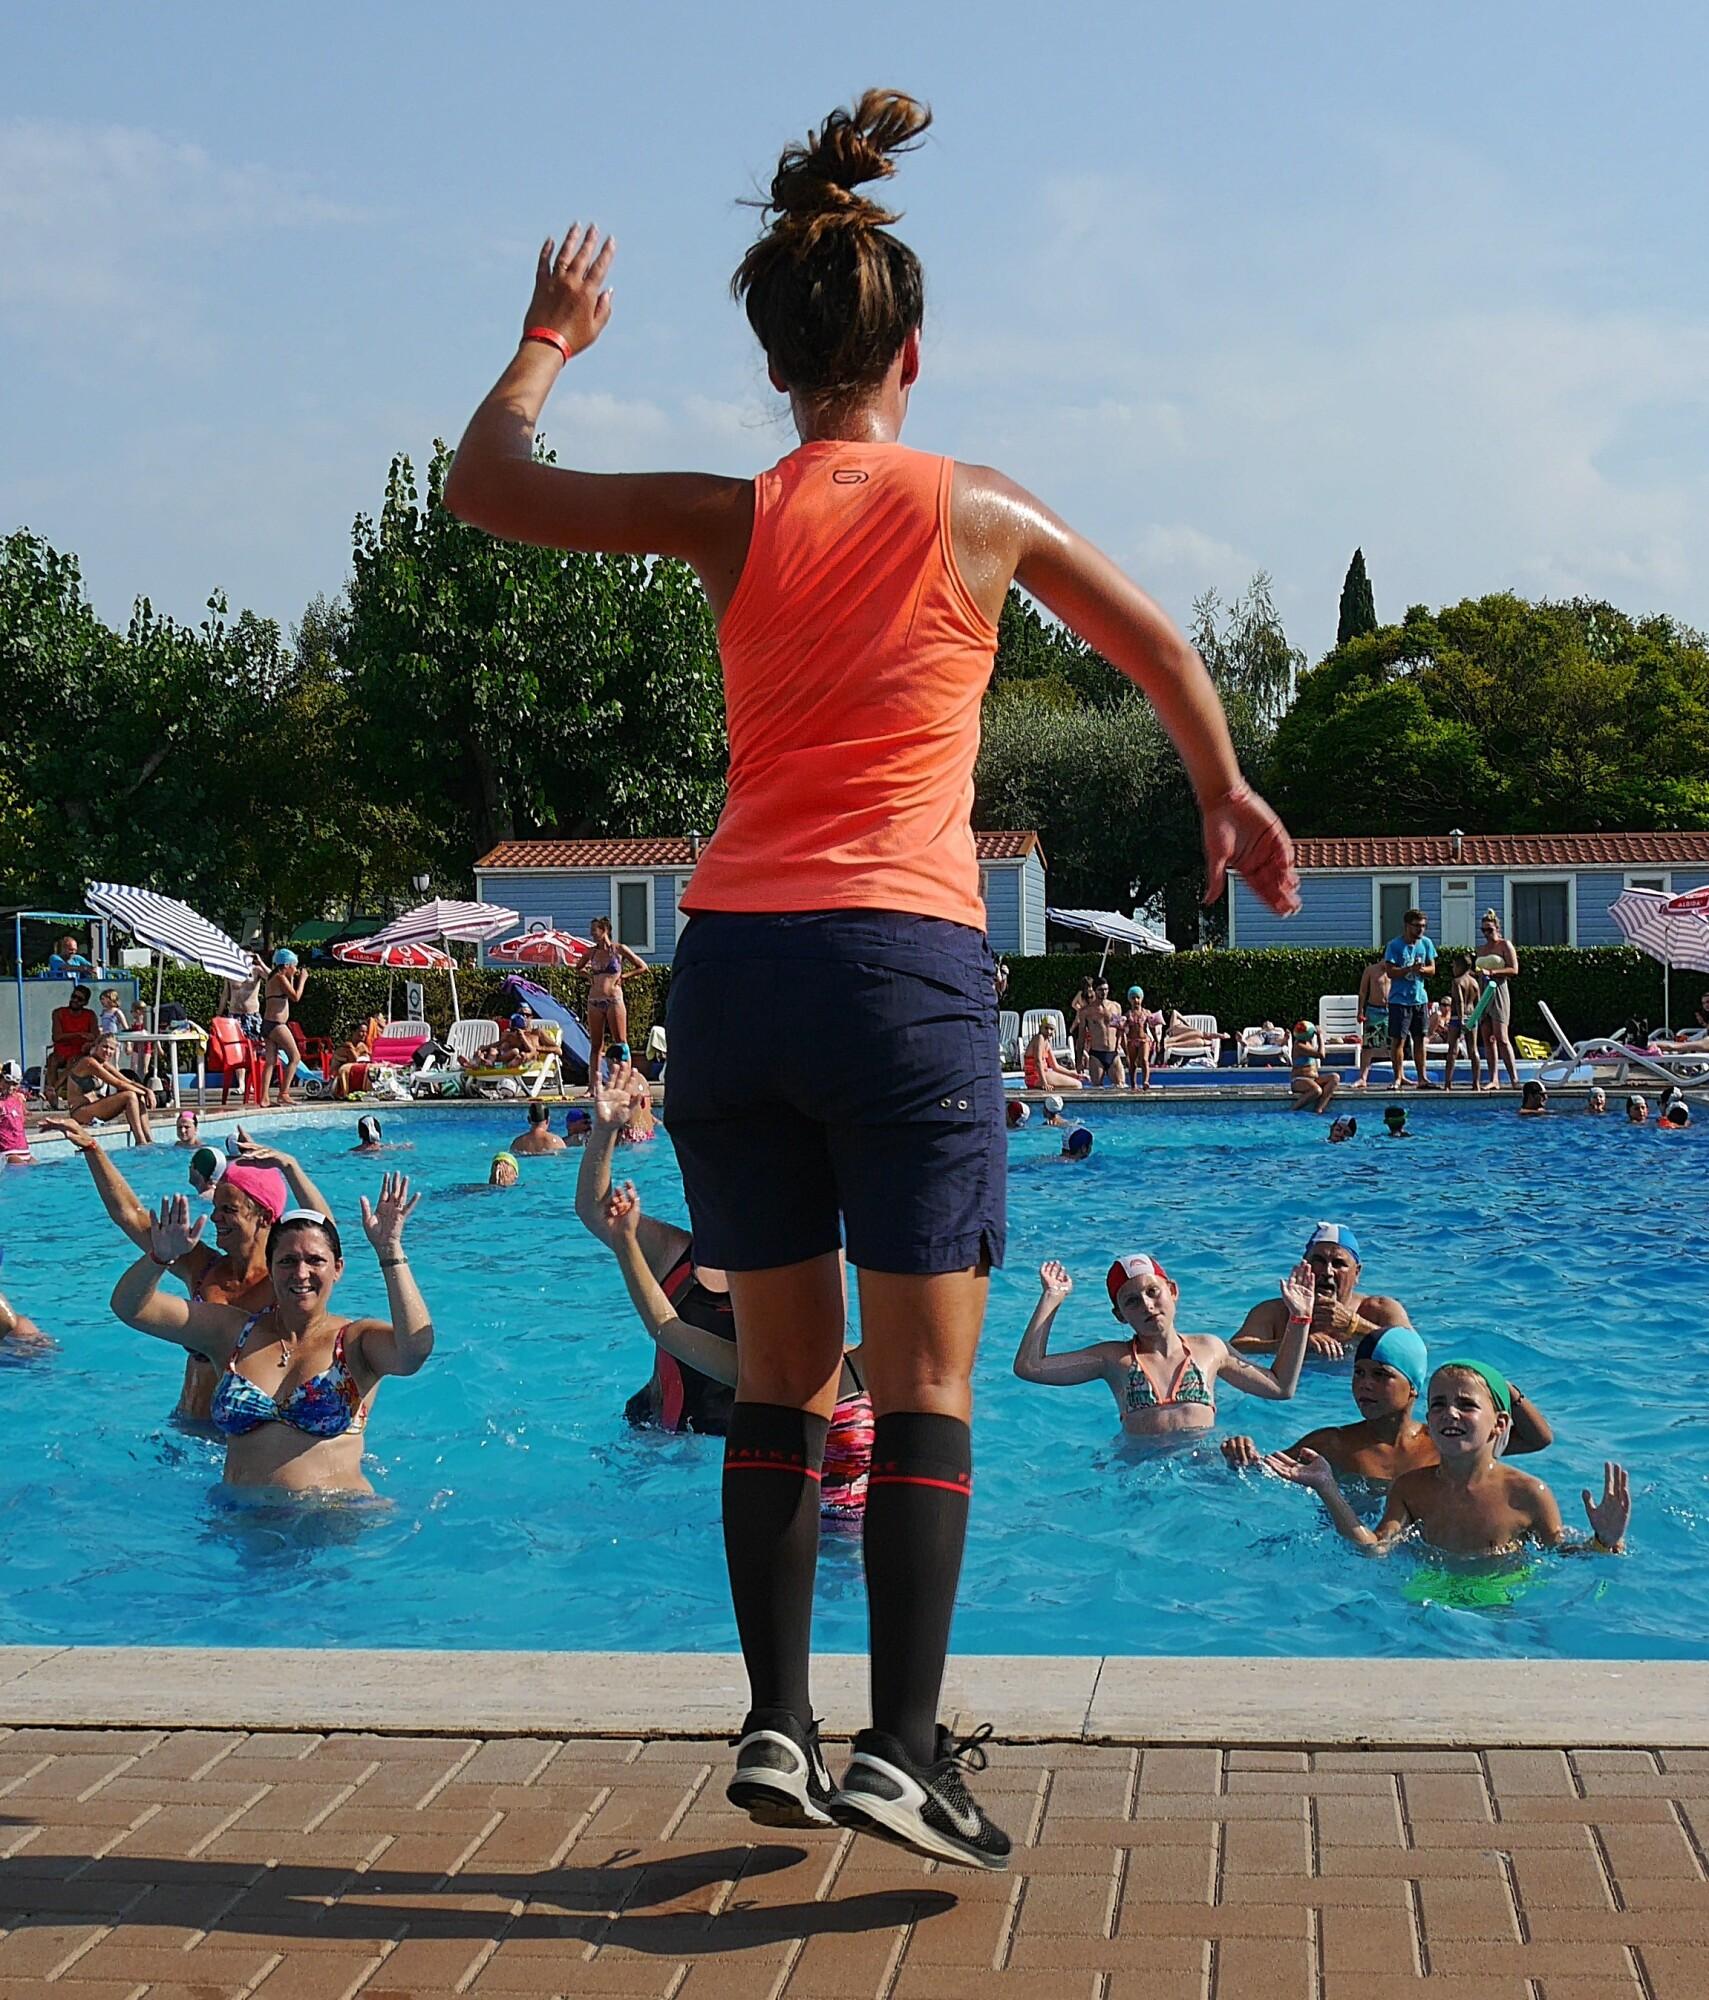 The Health Benefits of Water Aerobics